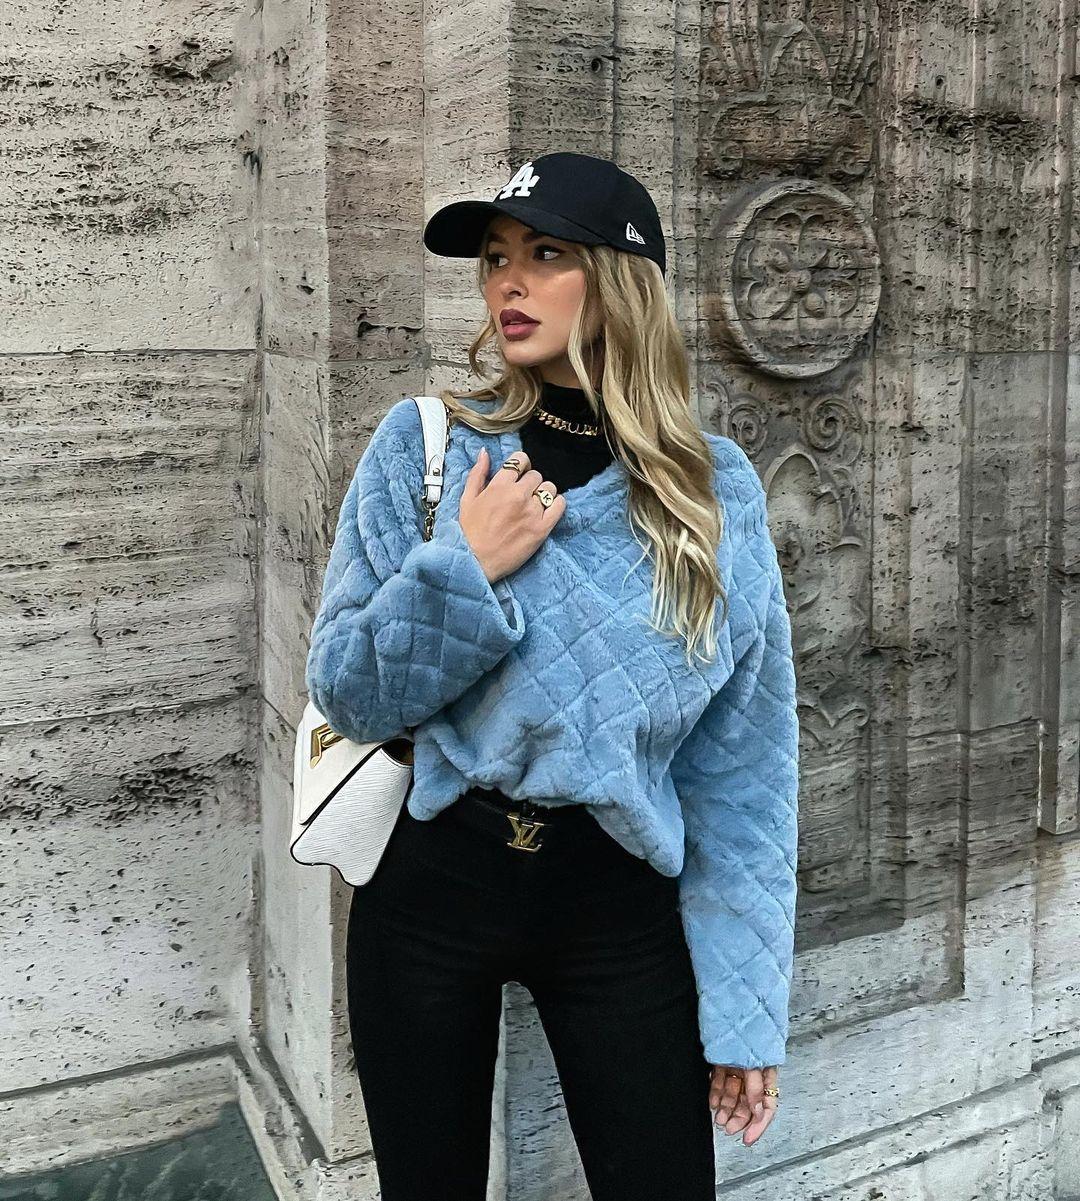 Elena-Kamperi-Wallpapers-Insta-Fit-Bio-3